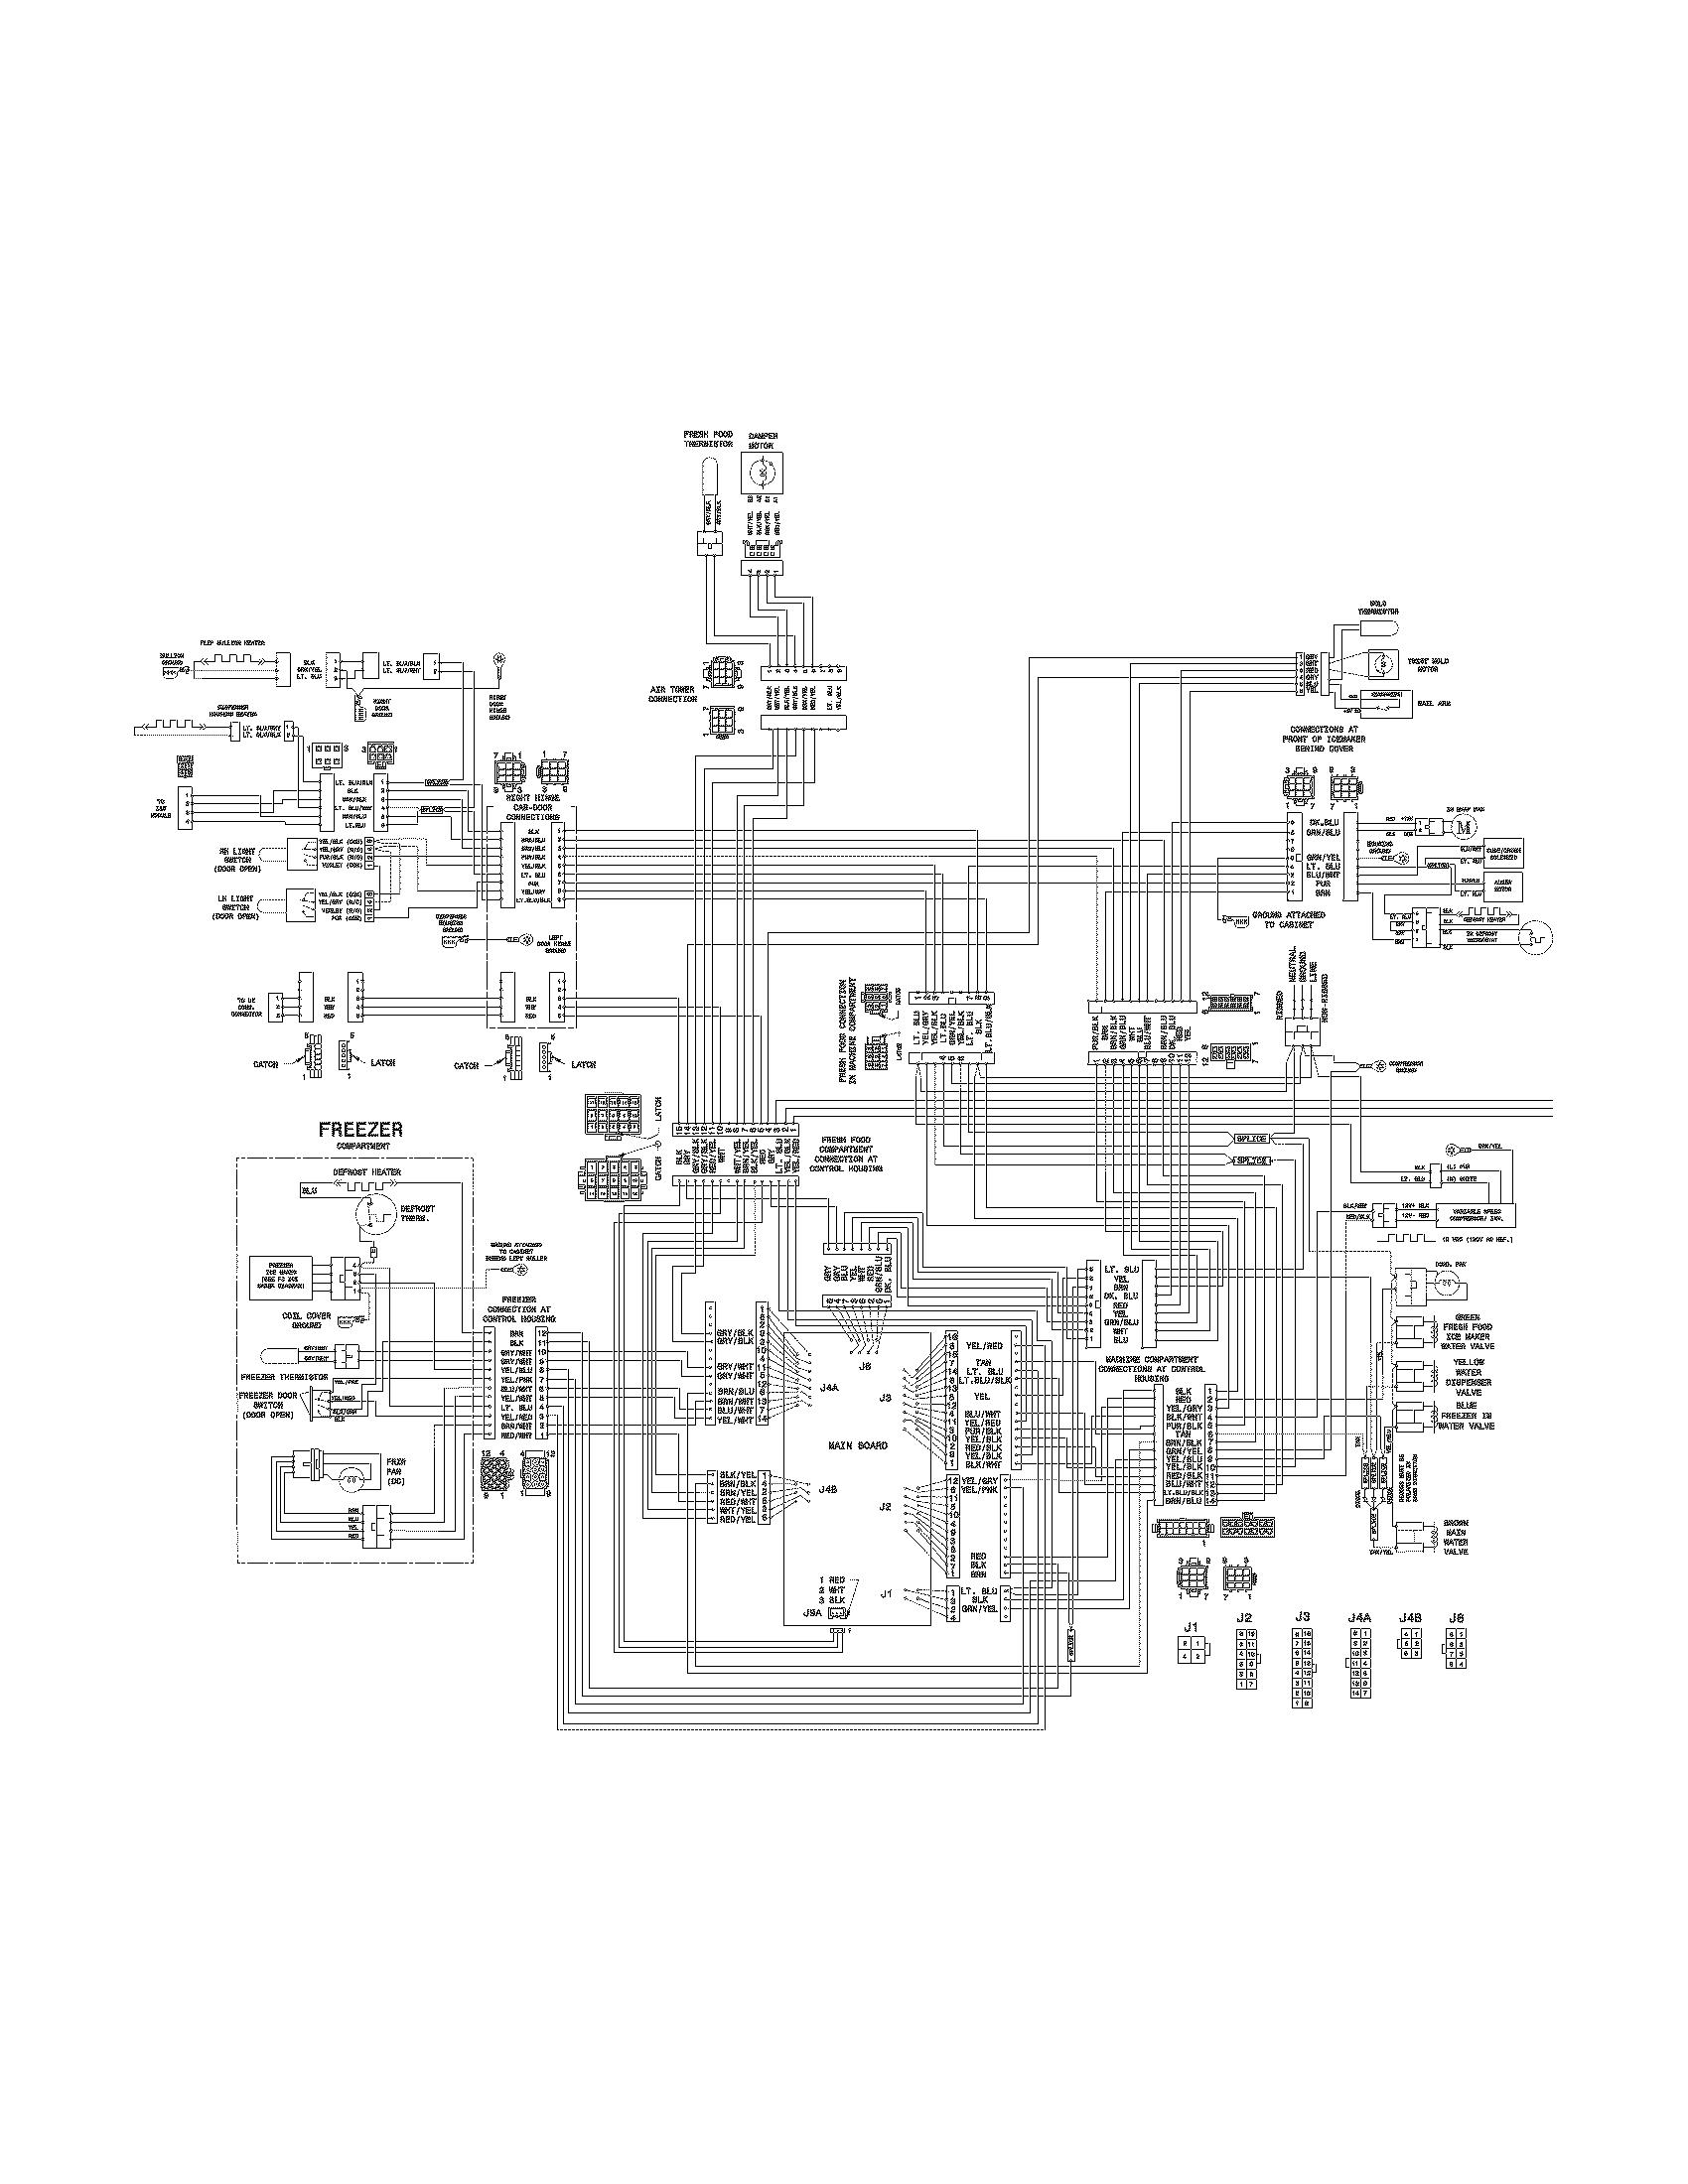 hight resolution of frigidaire model fphb2899pf3 bottom mount refrigerator genuine parts samsung refrigerator wiring schematic frigidaire refrigerator wiring schematic